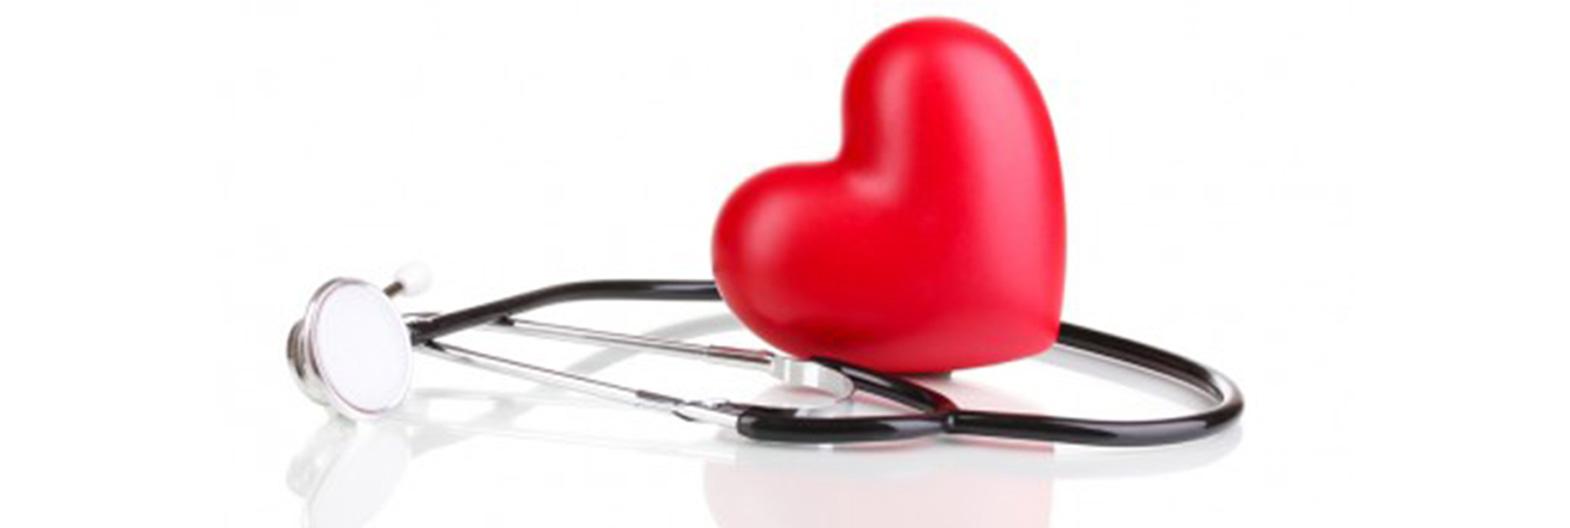 litinis mišinys sergant hipertenzija